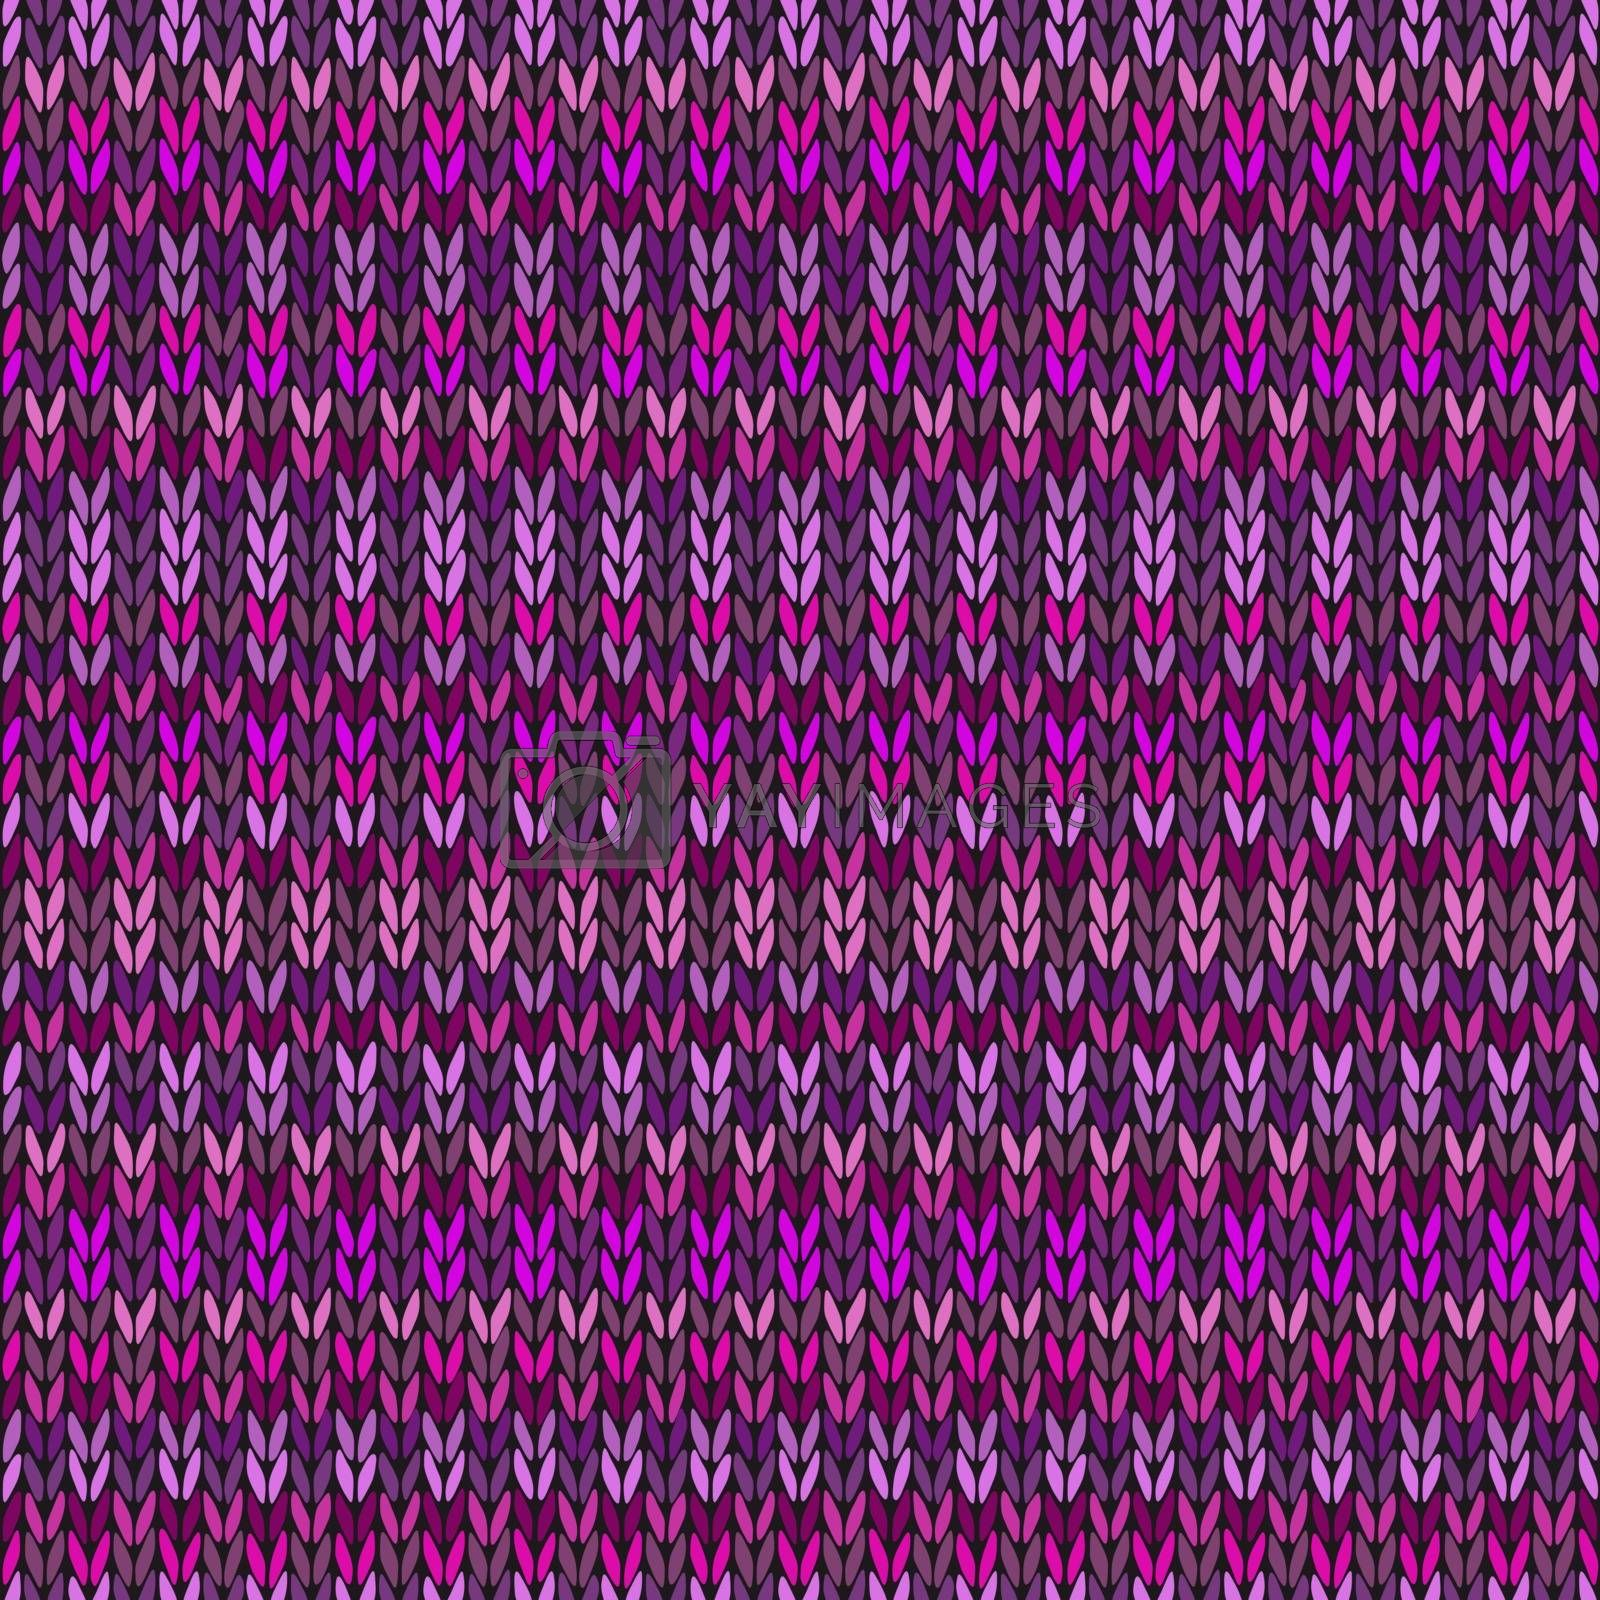 Vector Needlework Background, Violet Ornamental Knitted Pattern